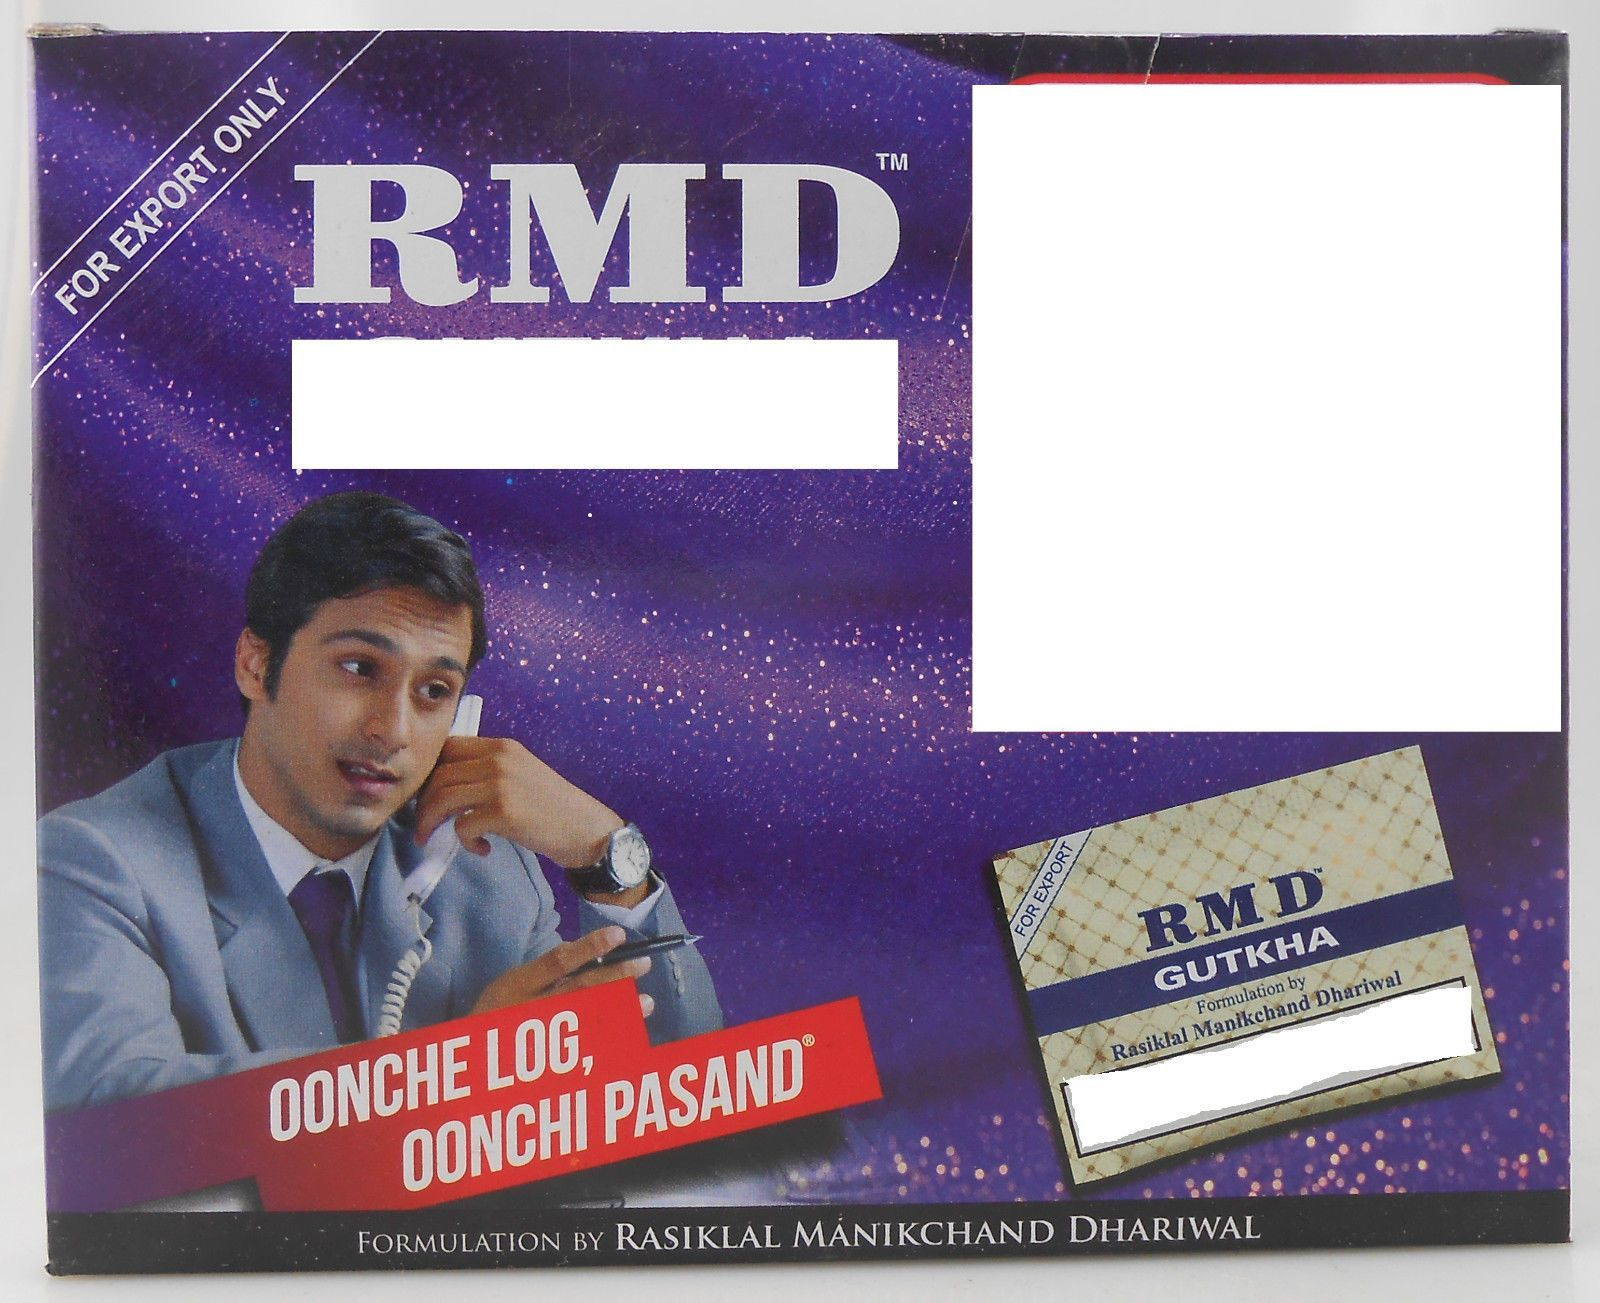 Rmd 50X4Grams Plastic Pouches Pan Paan Masala Manikchand